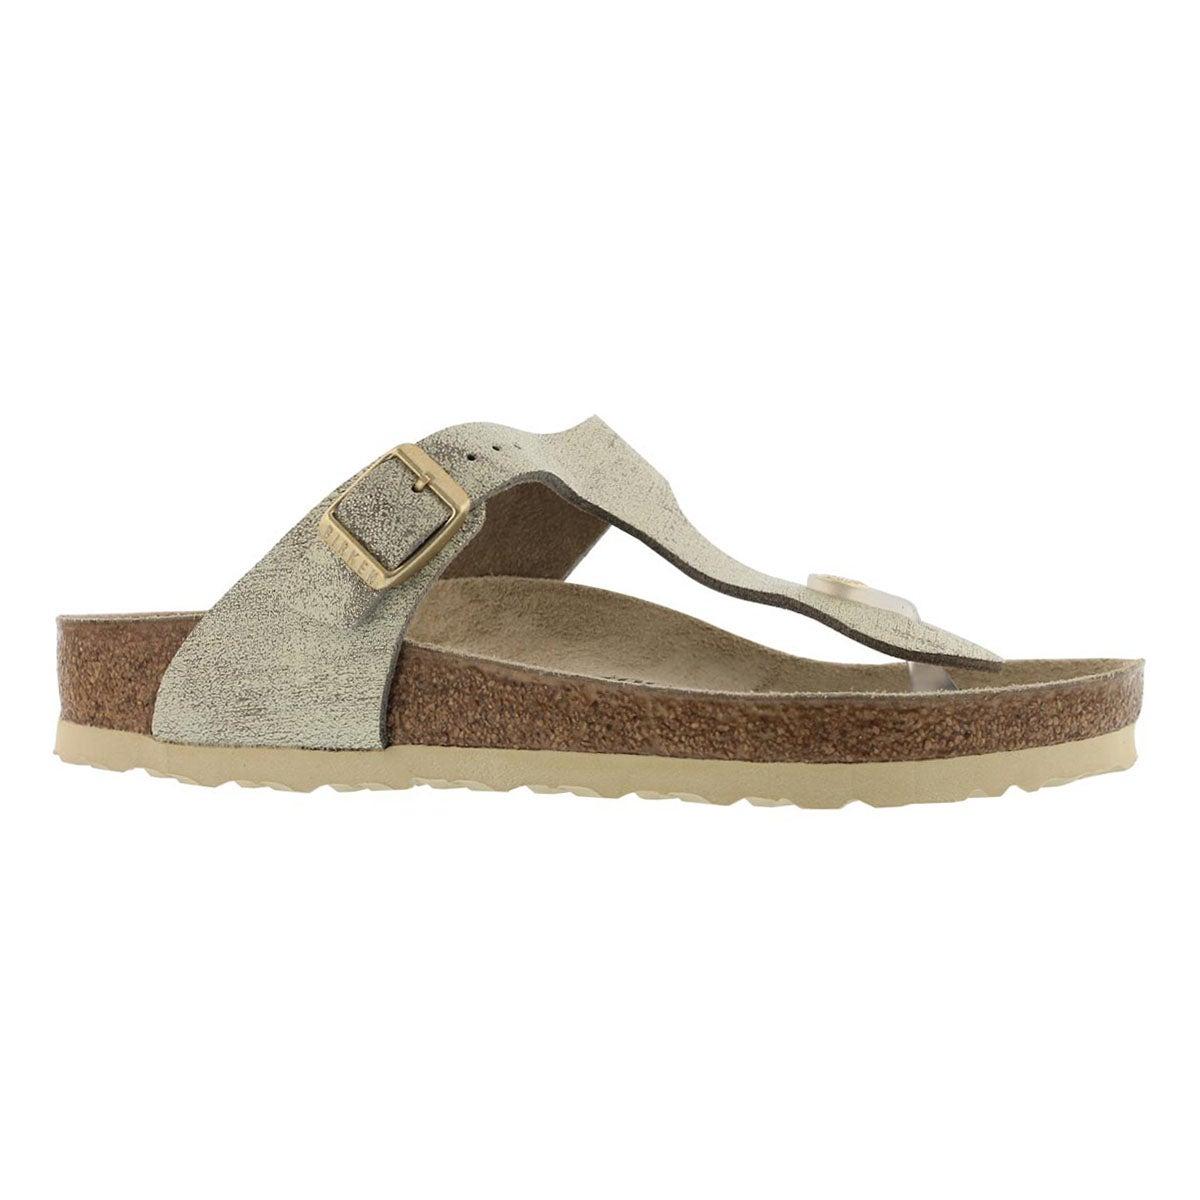 Women's GIZEH LTR wshd mtlc crm gld sandals